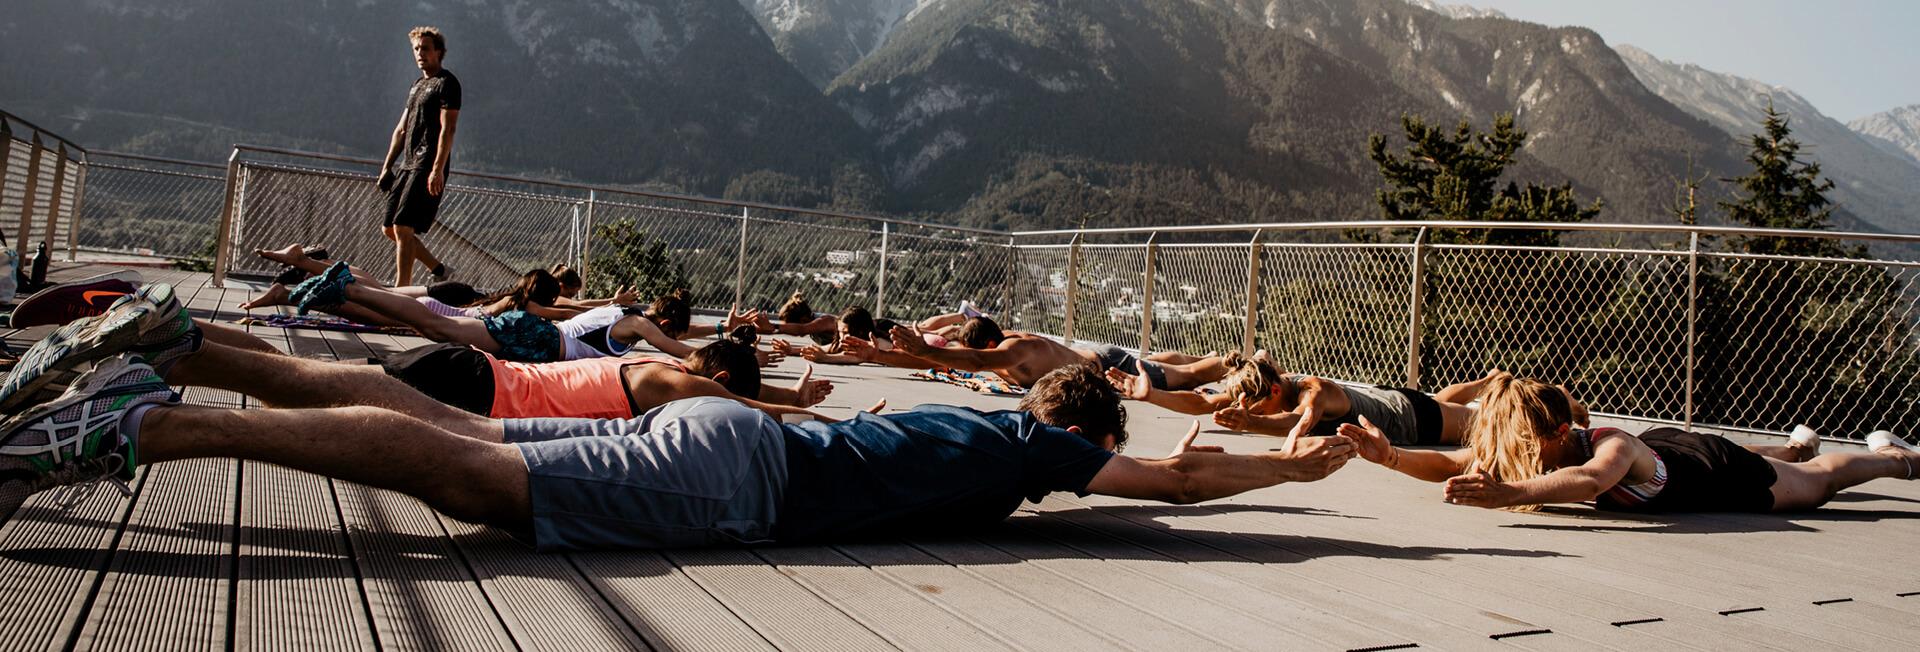 Sunset Trainings Session mit Basefive am Dach des Kaufhaus Tyrol